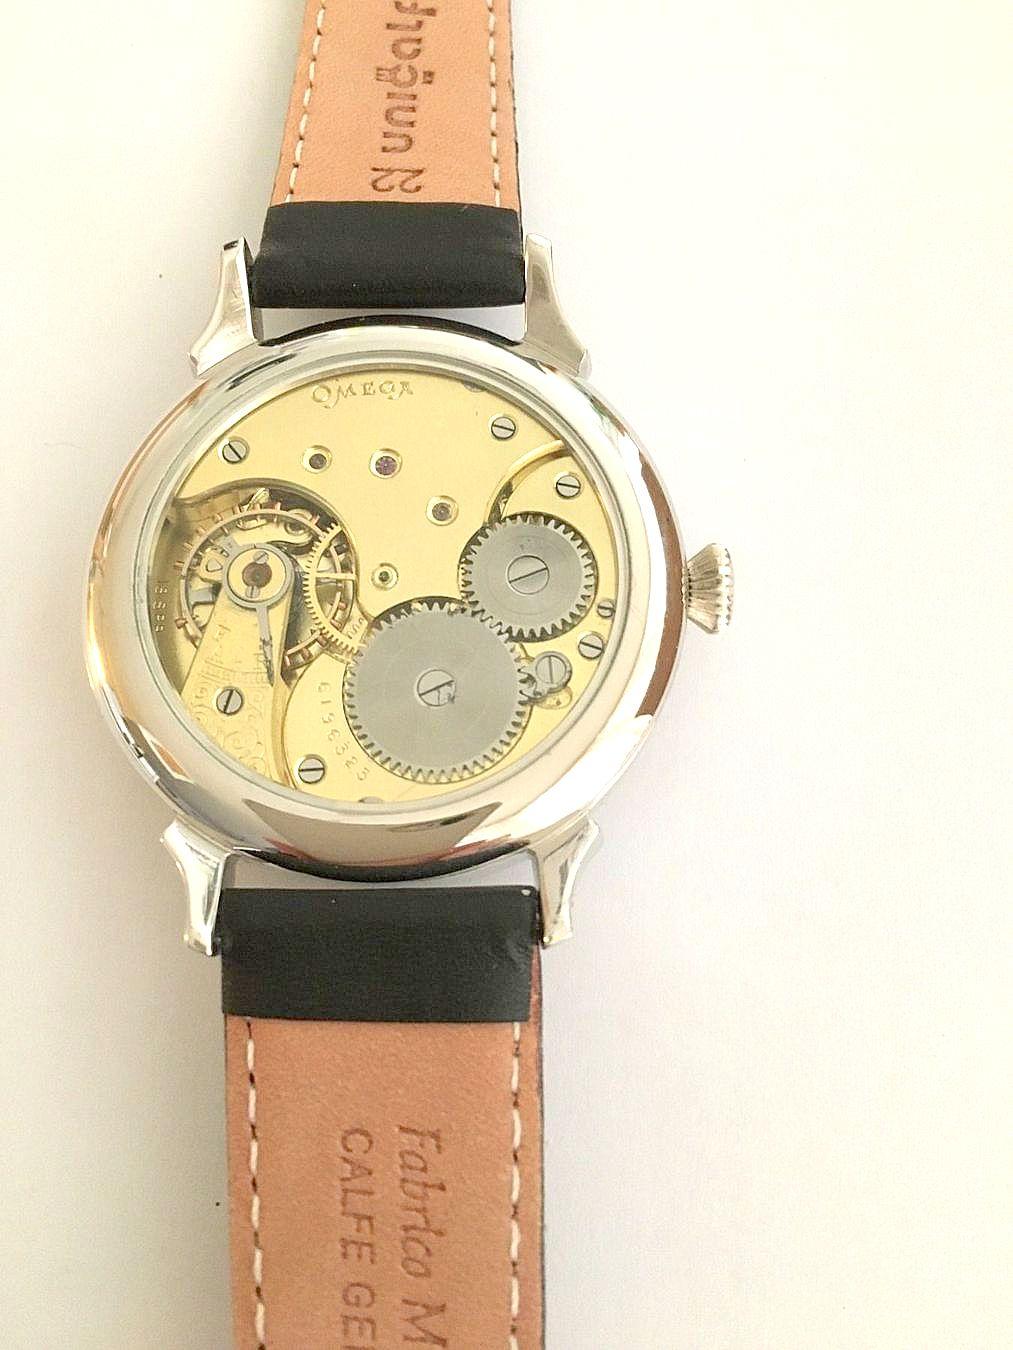 Omega / Marriage Watch - Transparent Large 46 mm - Gentlemen's Steel Wrist Watch - Image 3 of 3